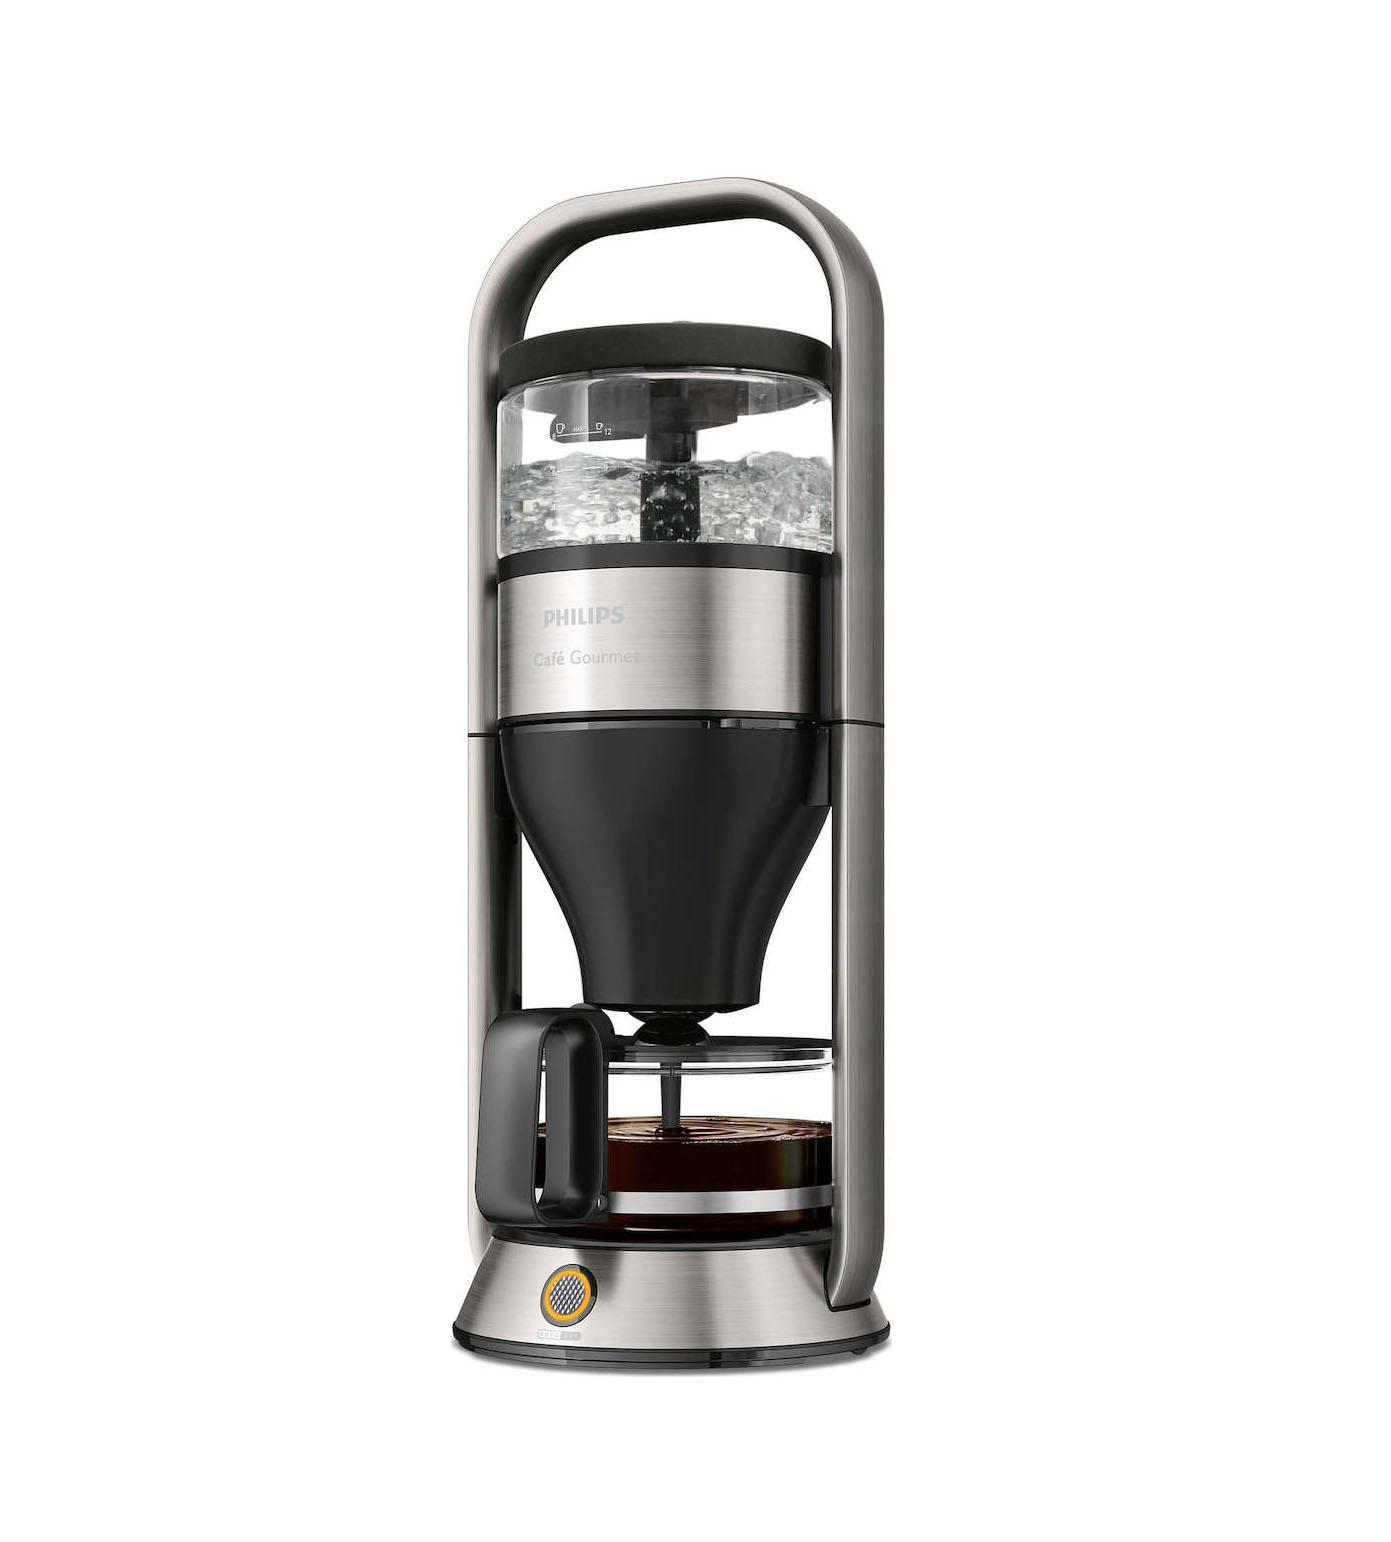 Philips HD 5413/00 Silver Καφετιέρα Φίλτρου Πληρωμή έως 24 δόσεις